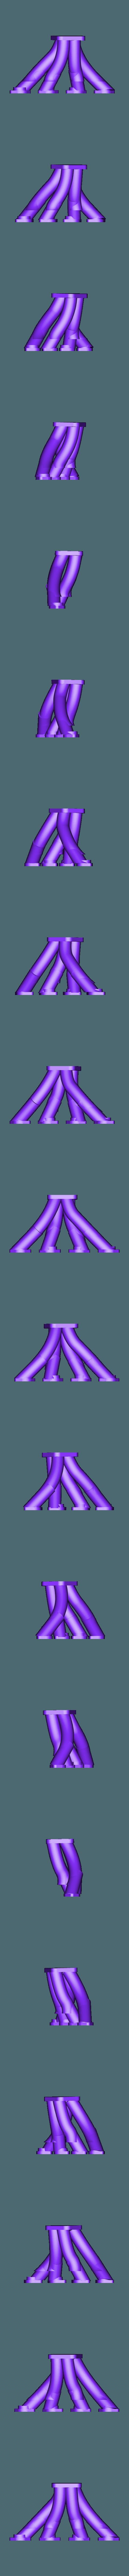 collecteur court turbo gauche .stl Download STL file Fury road hotrod bodyshell 1/10 • 3D printing design, RCGANG93